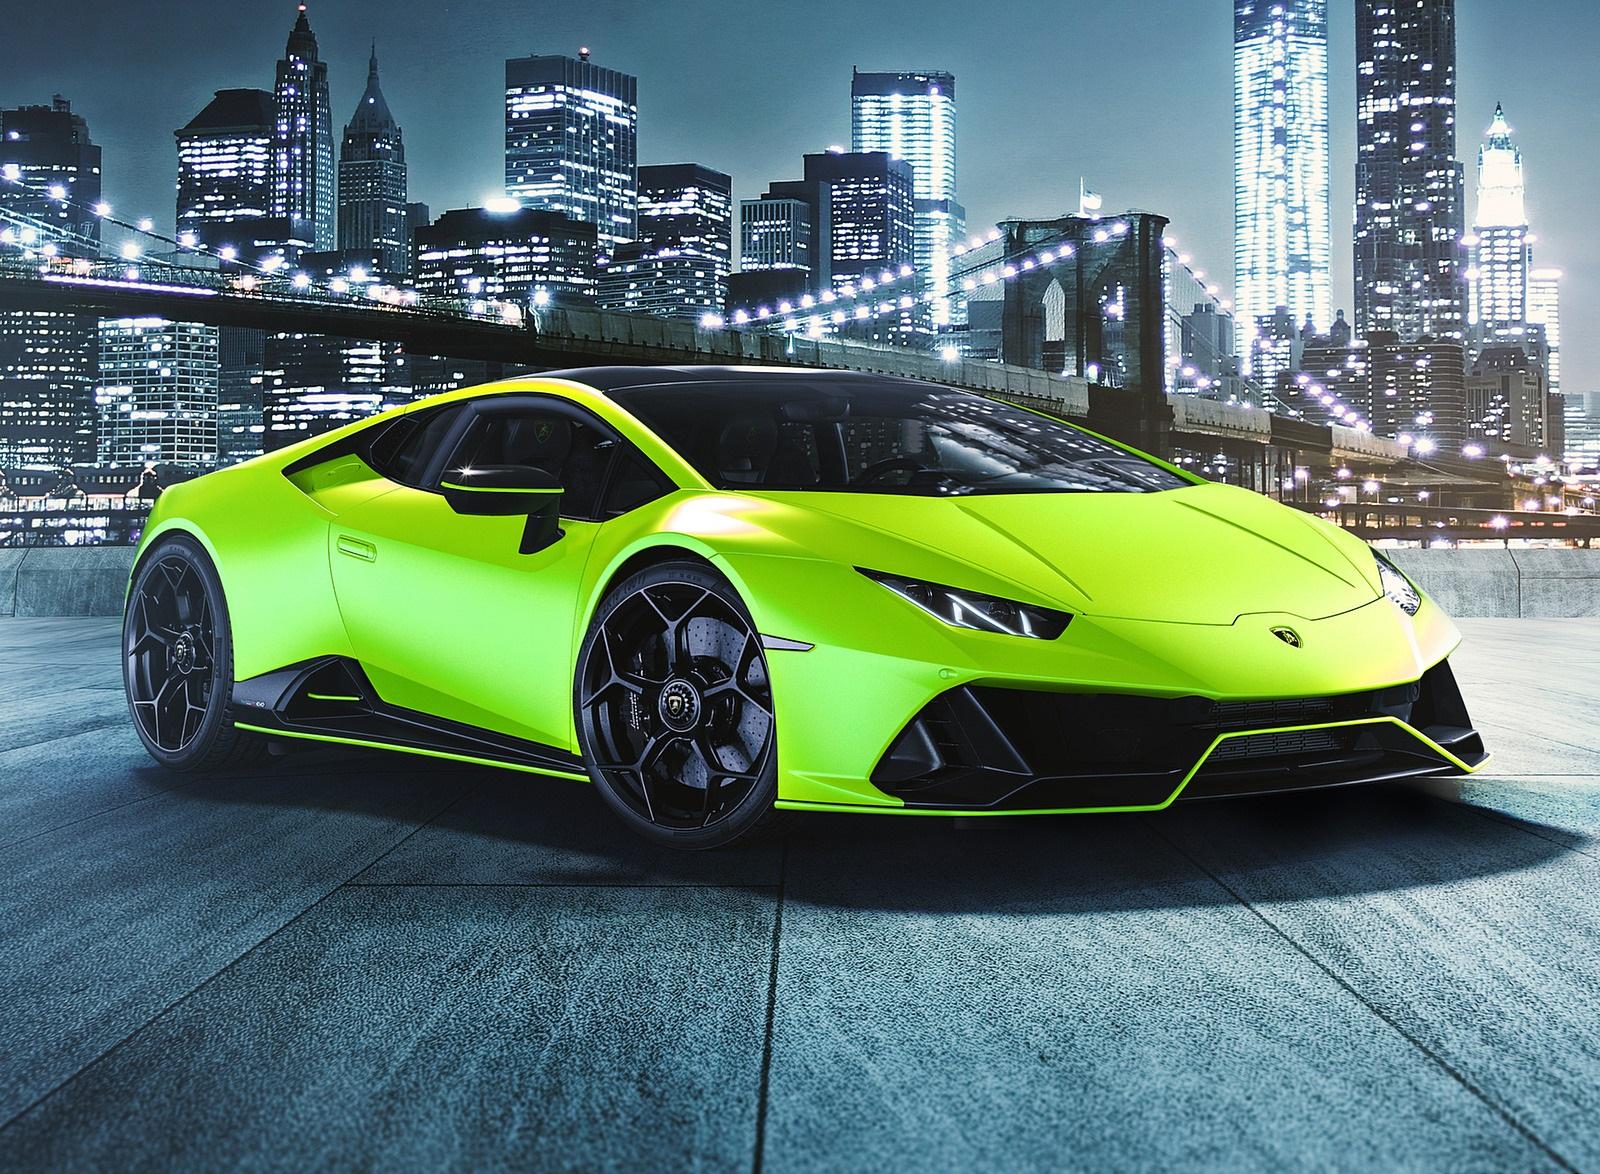 2021 Lamborghini Huracán EVO Fluo Capsule (Color: Green) Front Three-Quarter Wallpapers (6)